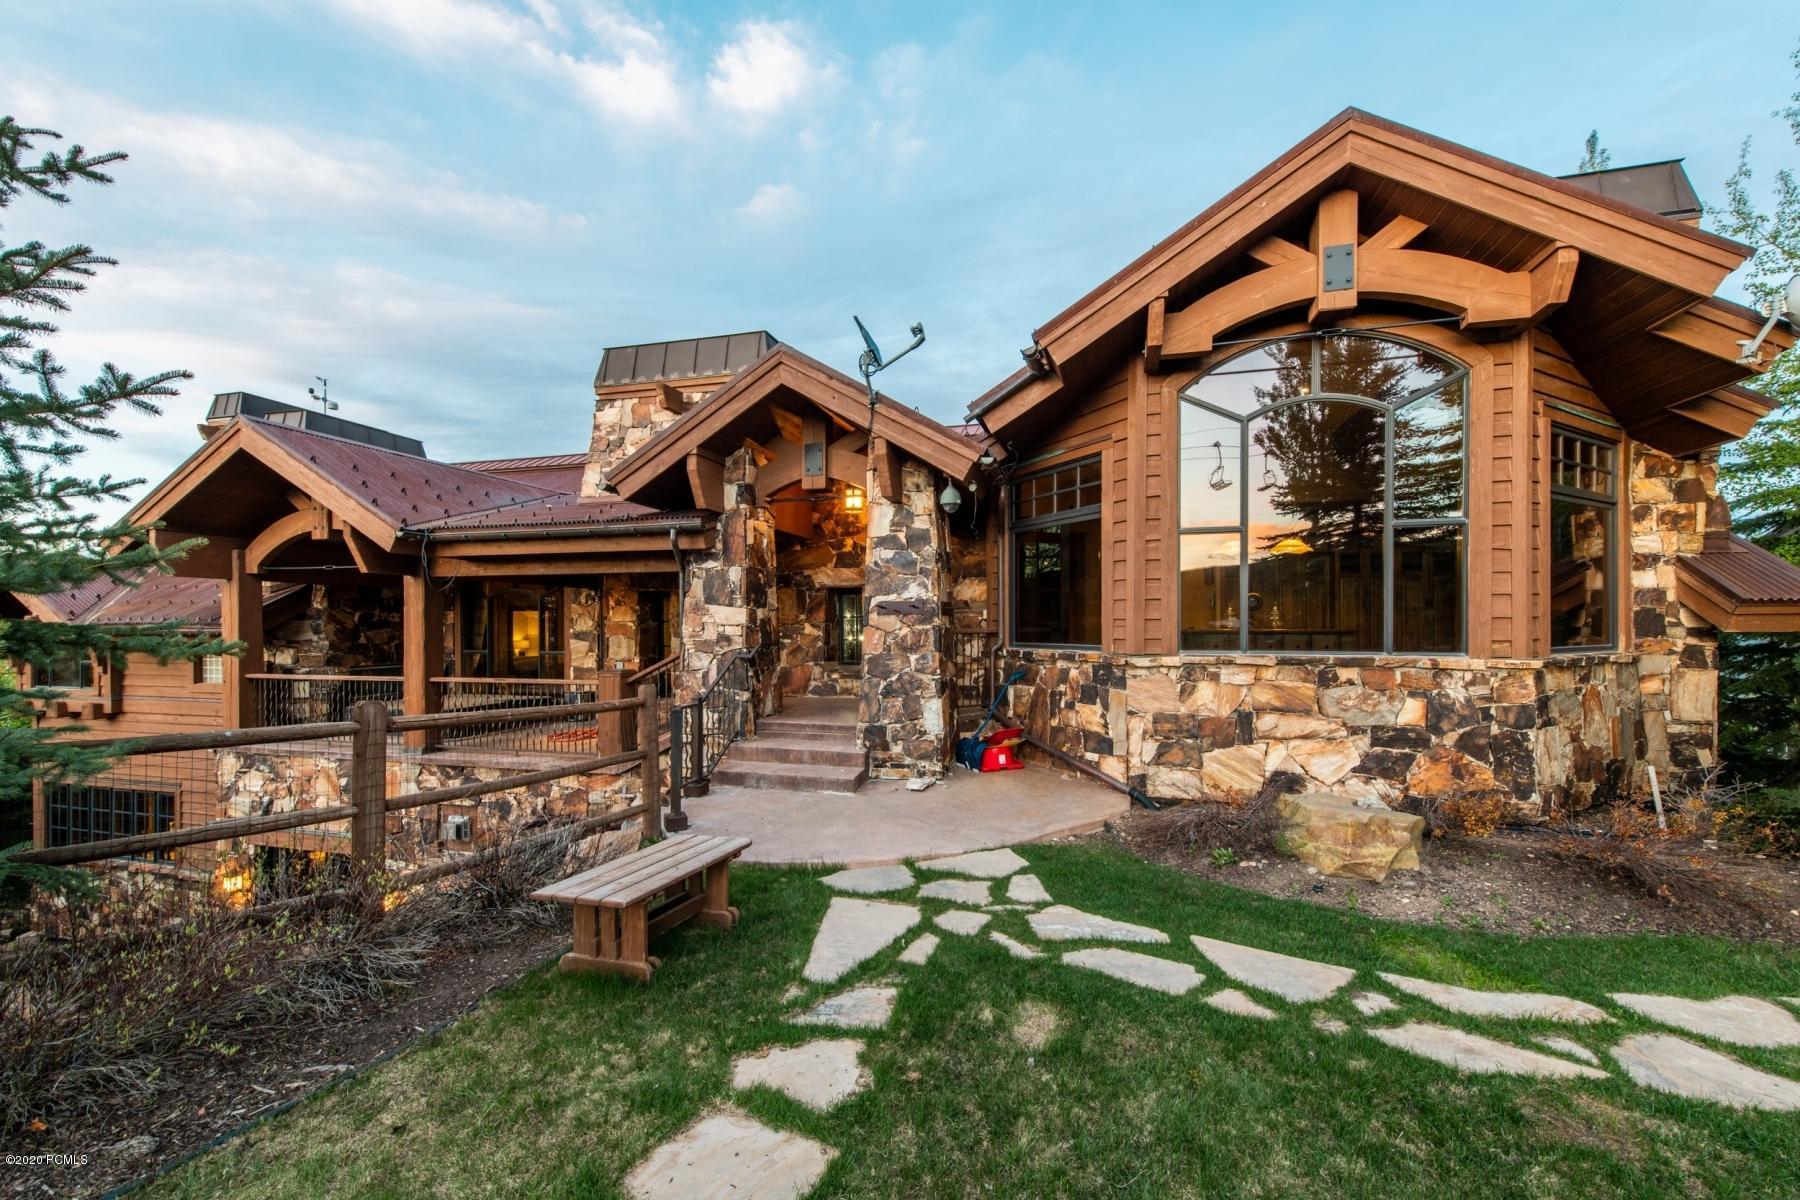 9840 Summit View Drive, Heber City, Utah 84032, 7 Bedrooms Bedrooms, ,9 BathroomsBathrooms,Single Family,For Sale,Summit View,20190109112430415765000000